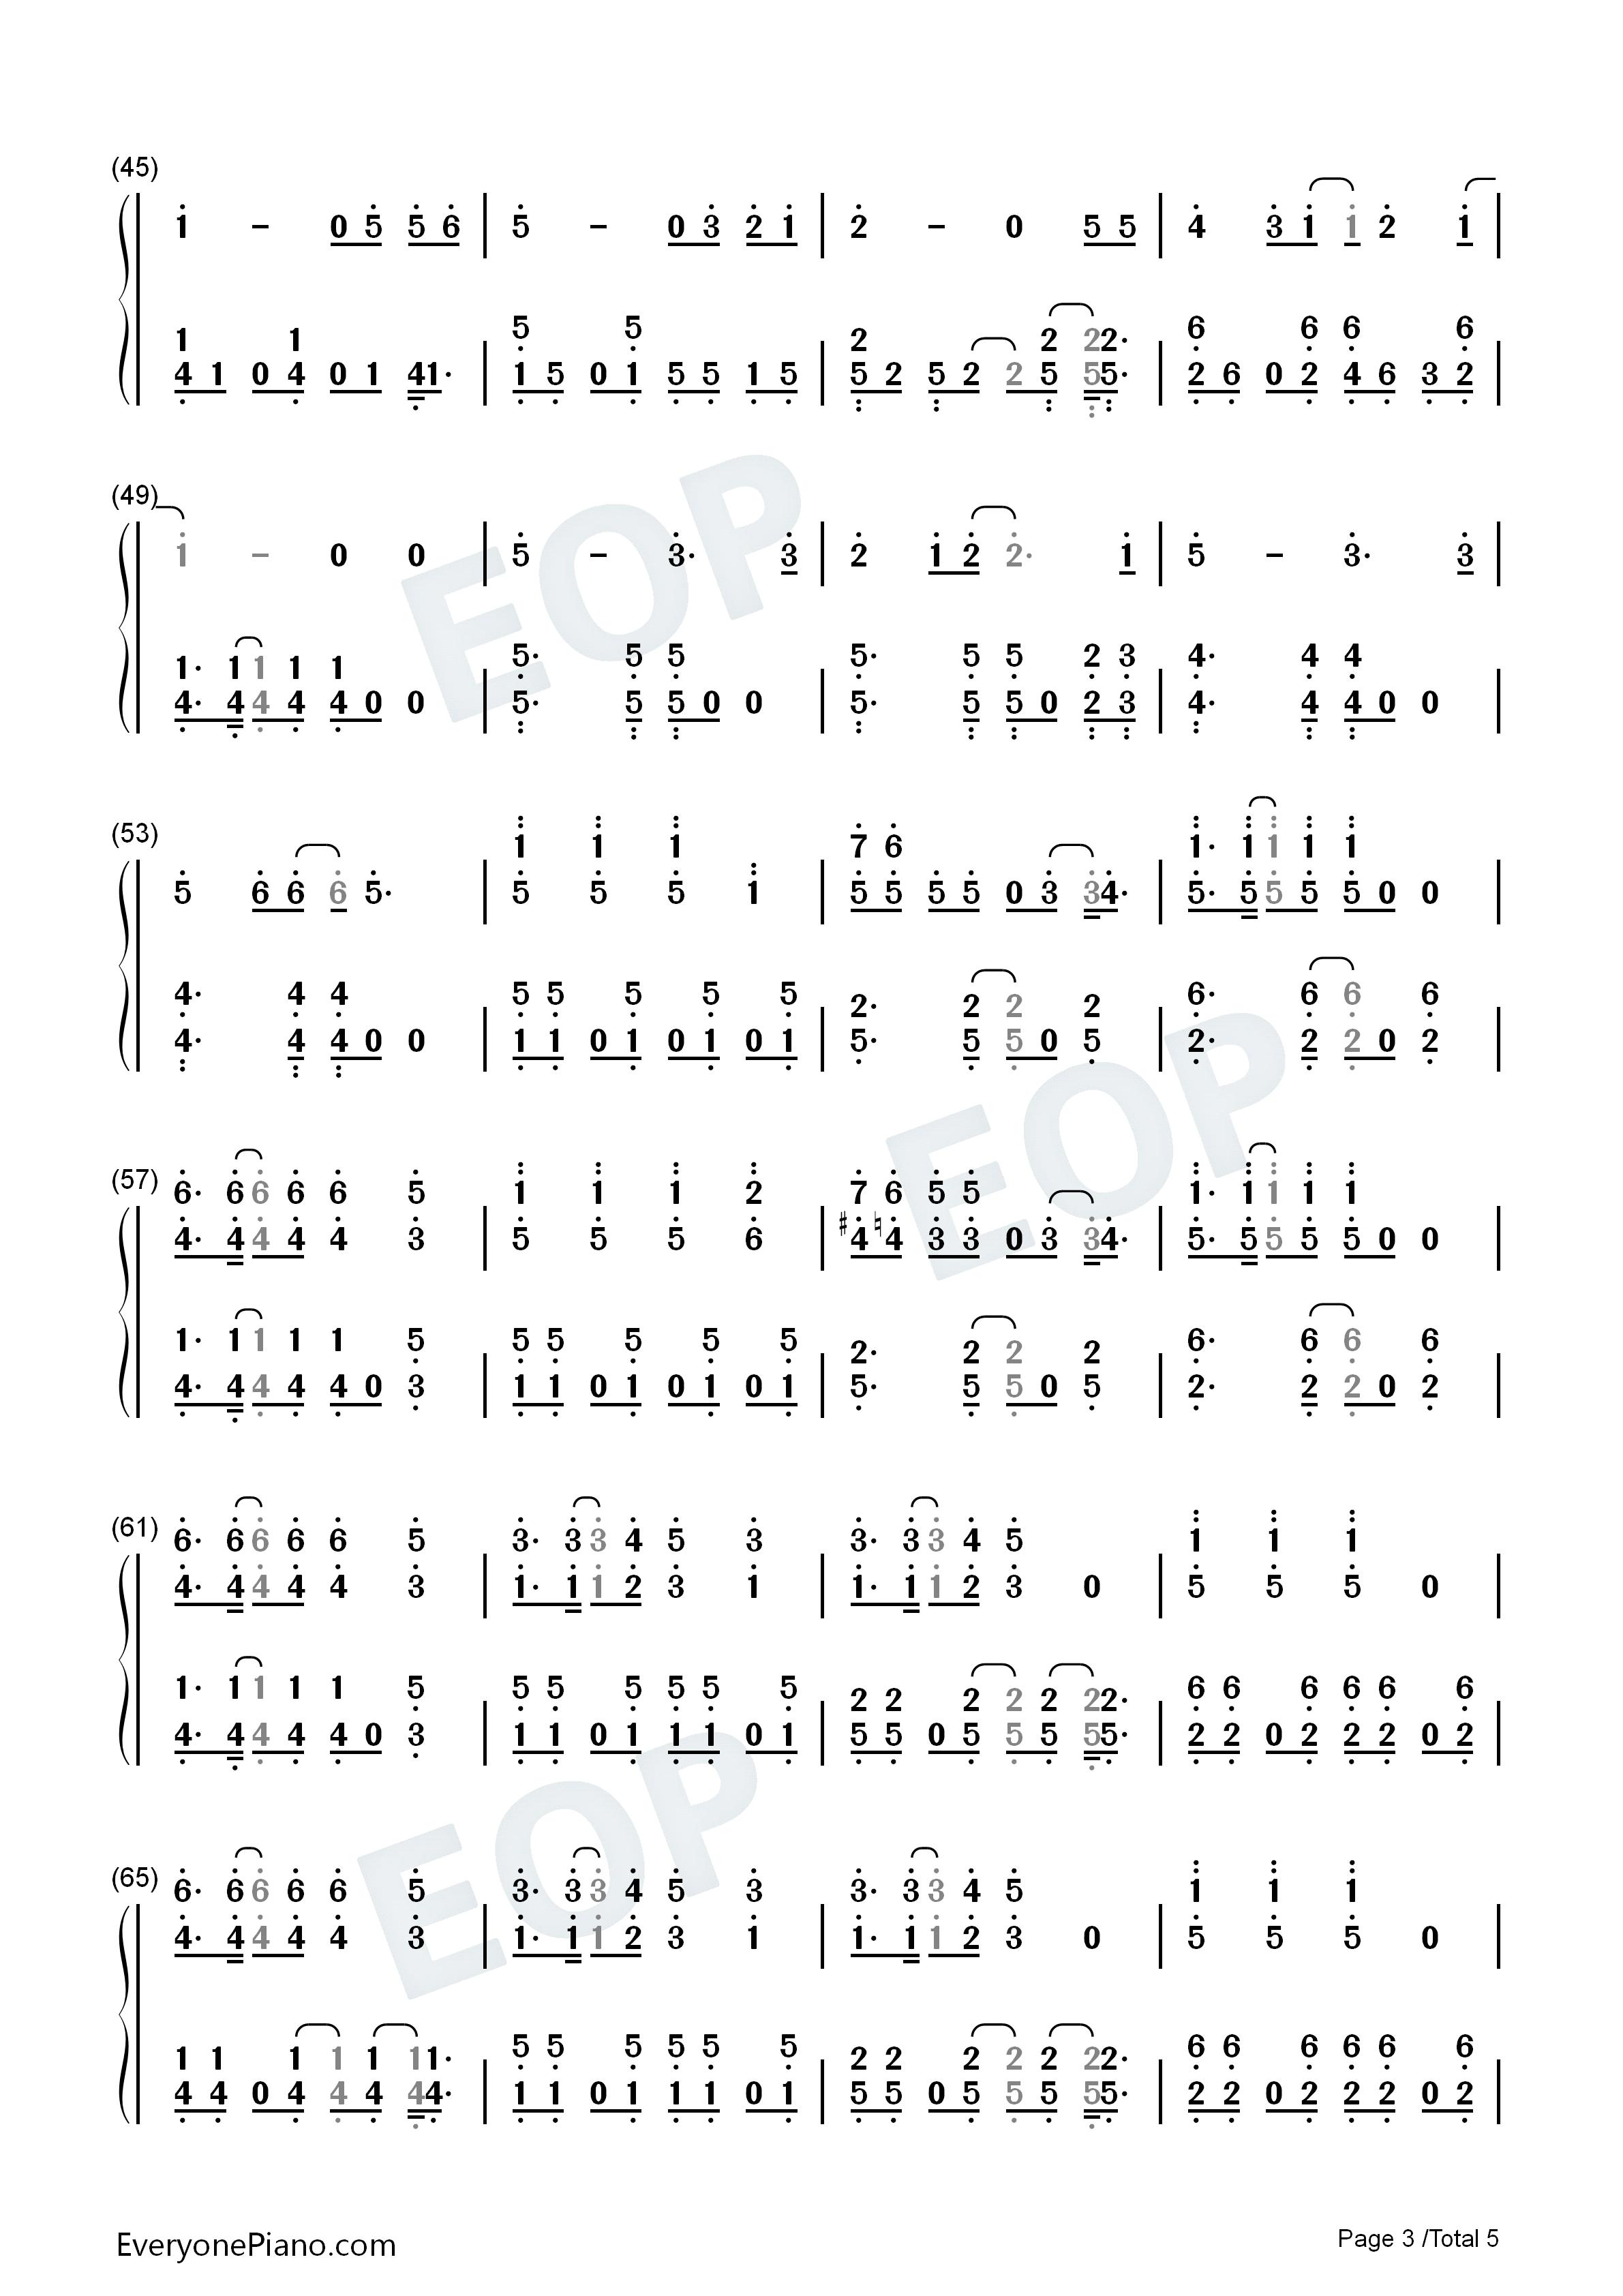 exo电子琴数字简谱